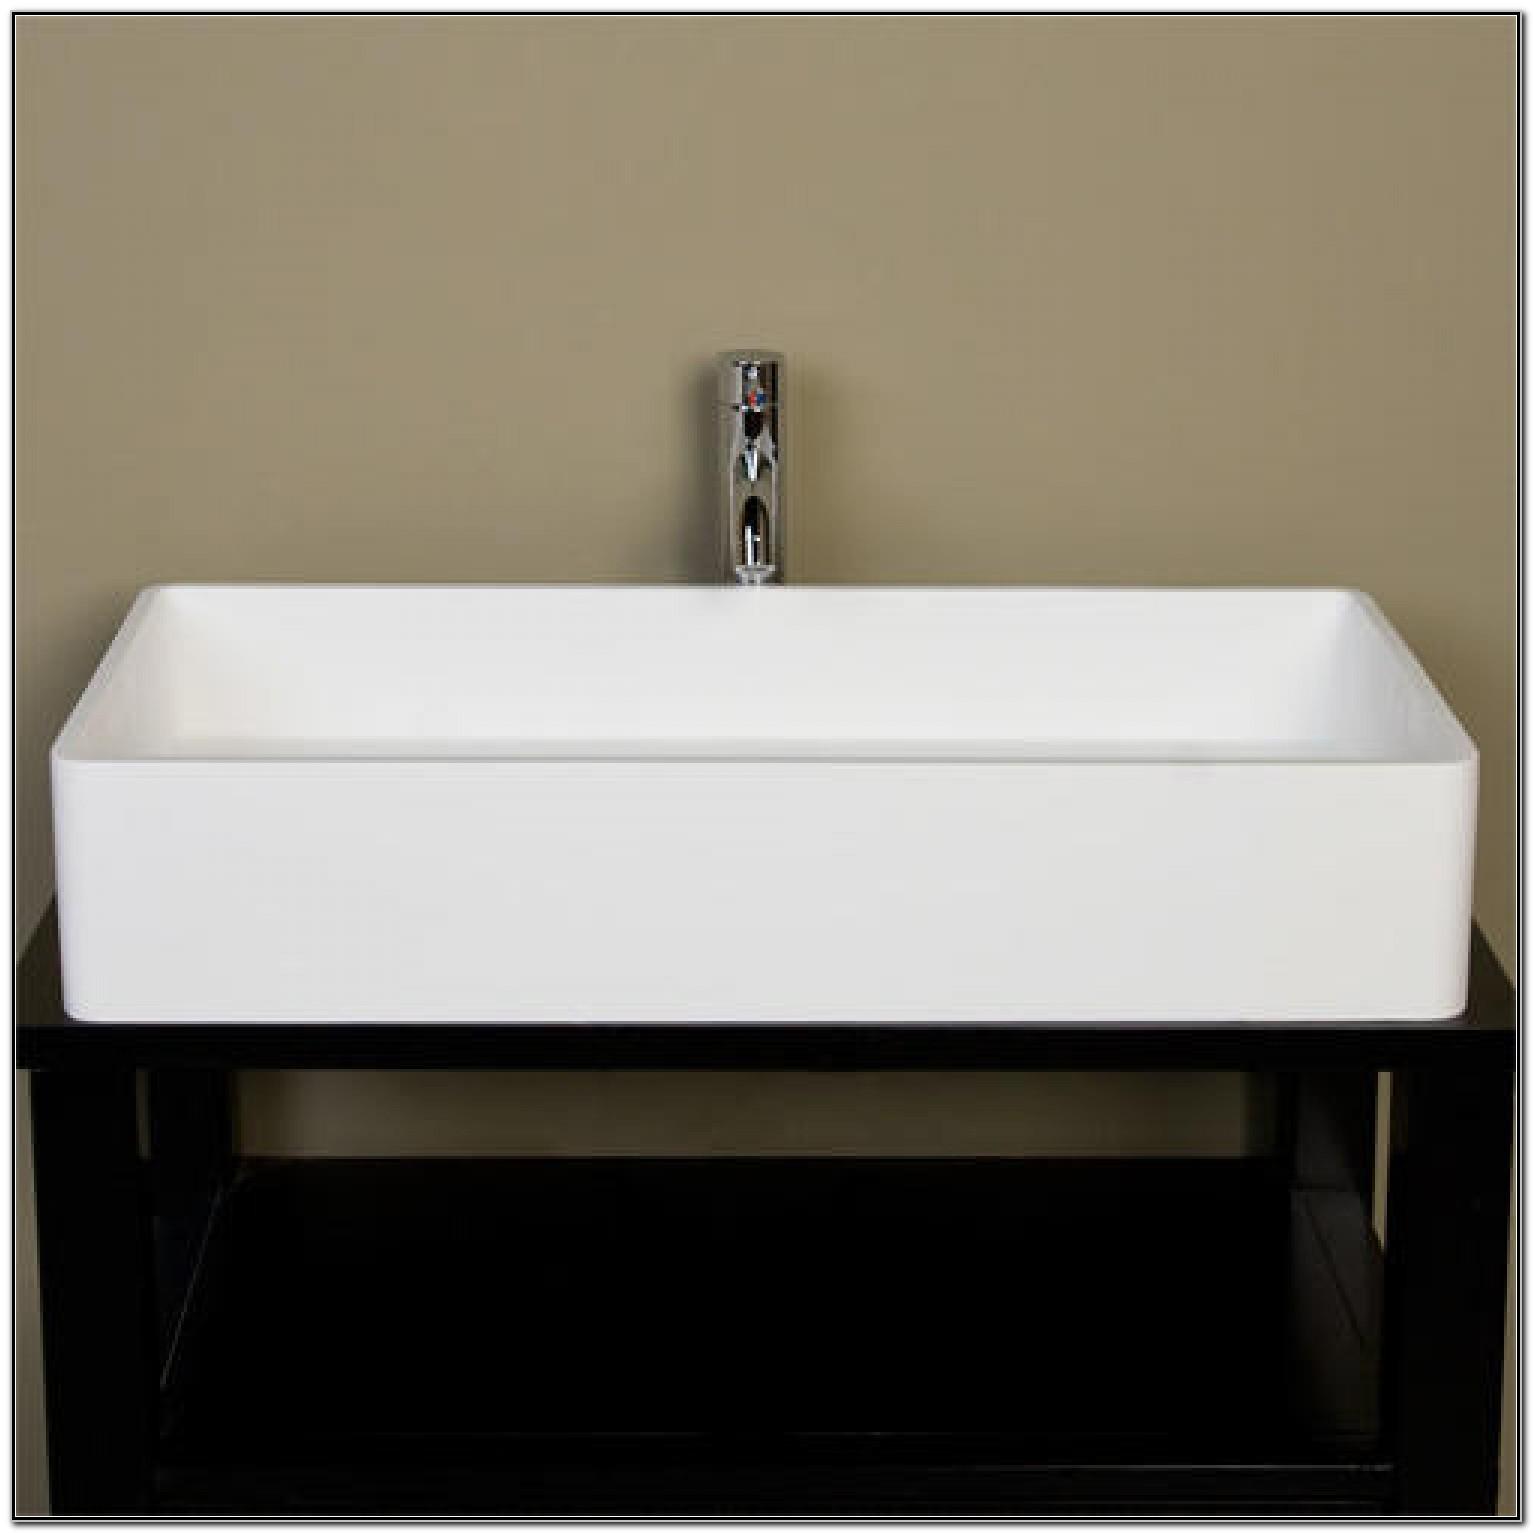 Small White Rectangular Vessel Sink